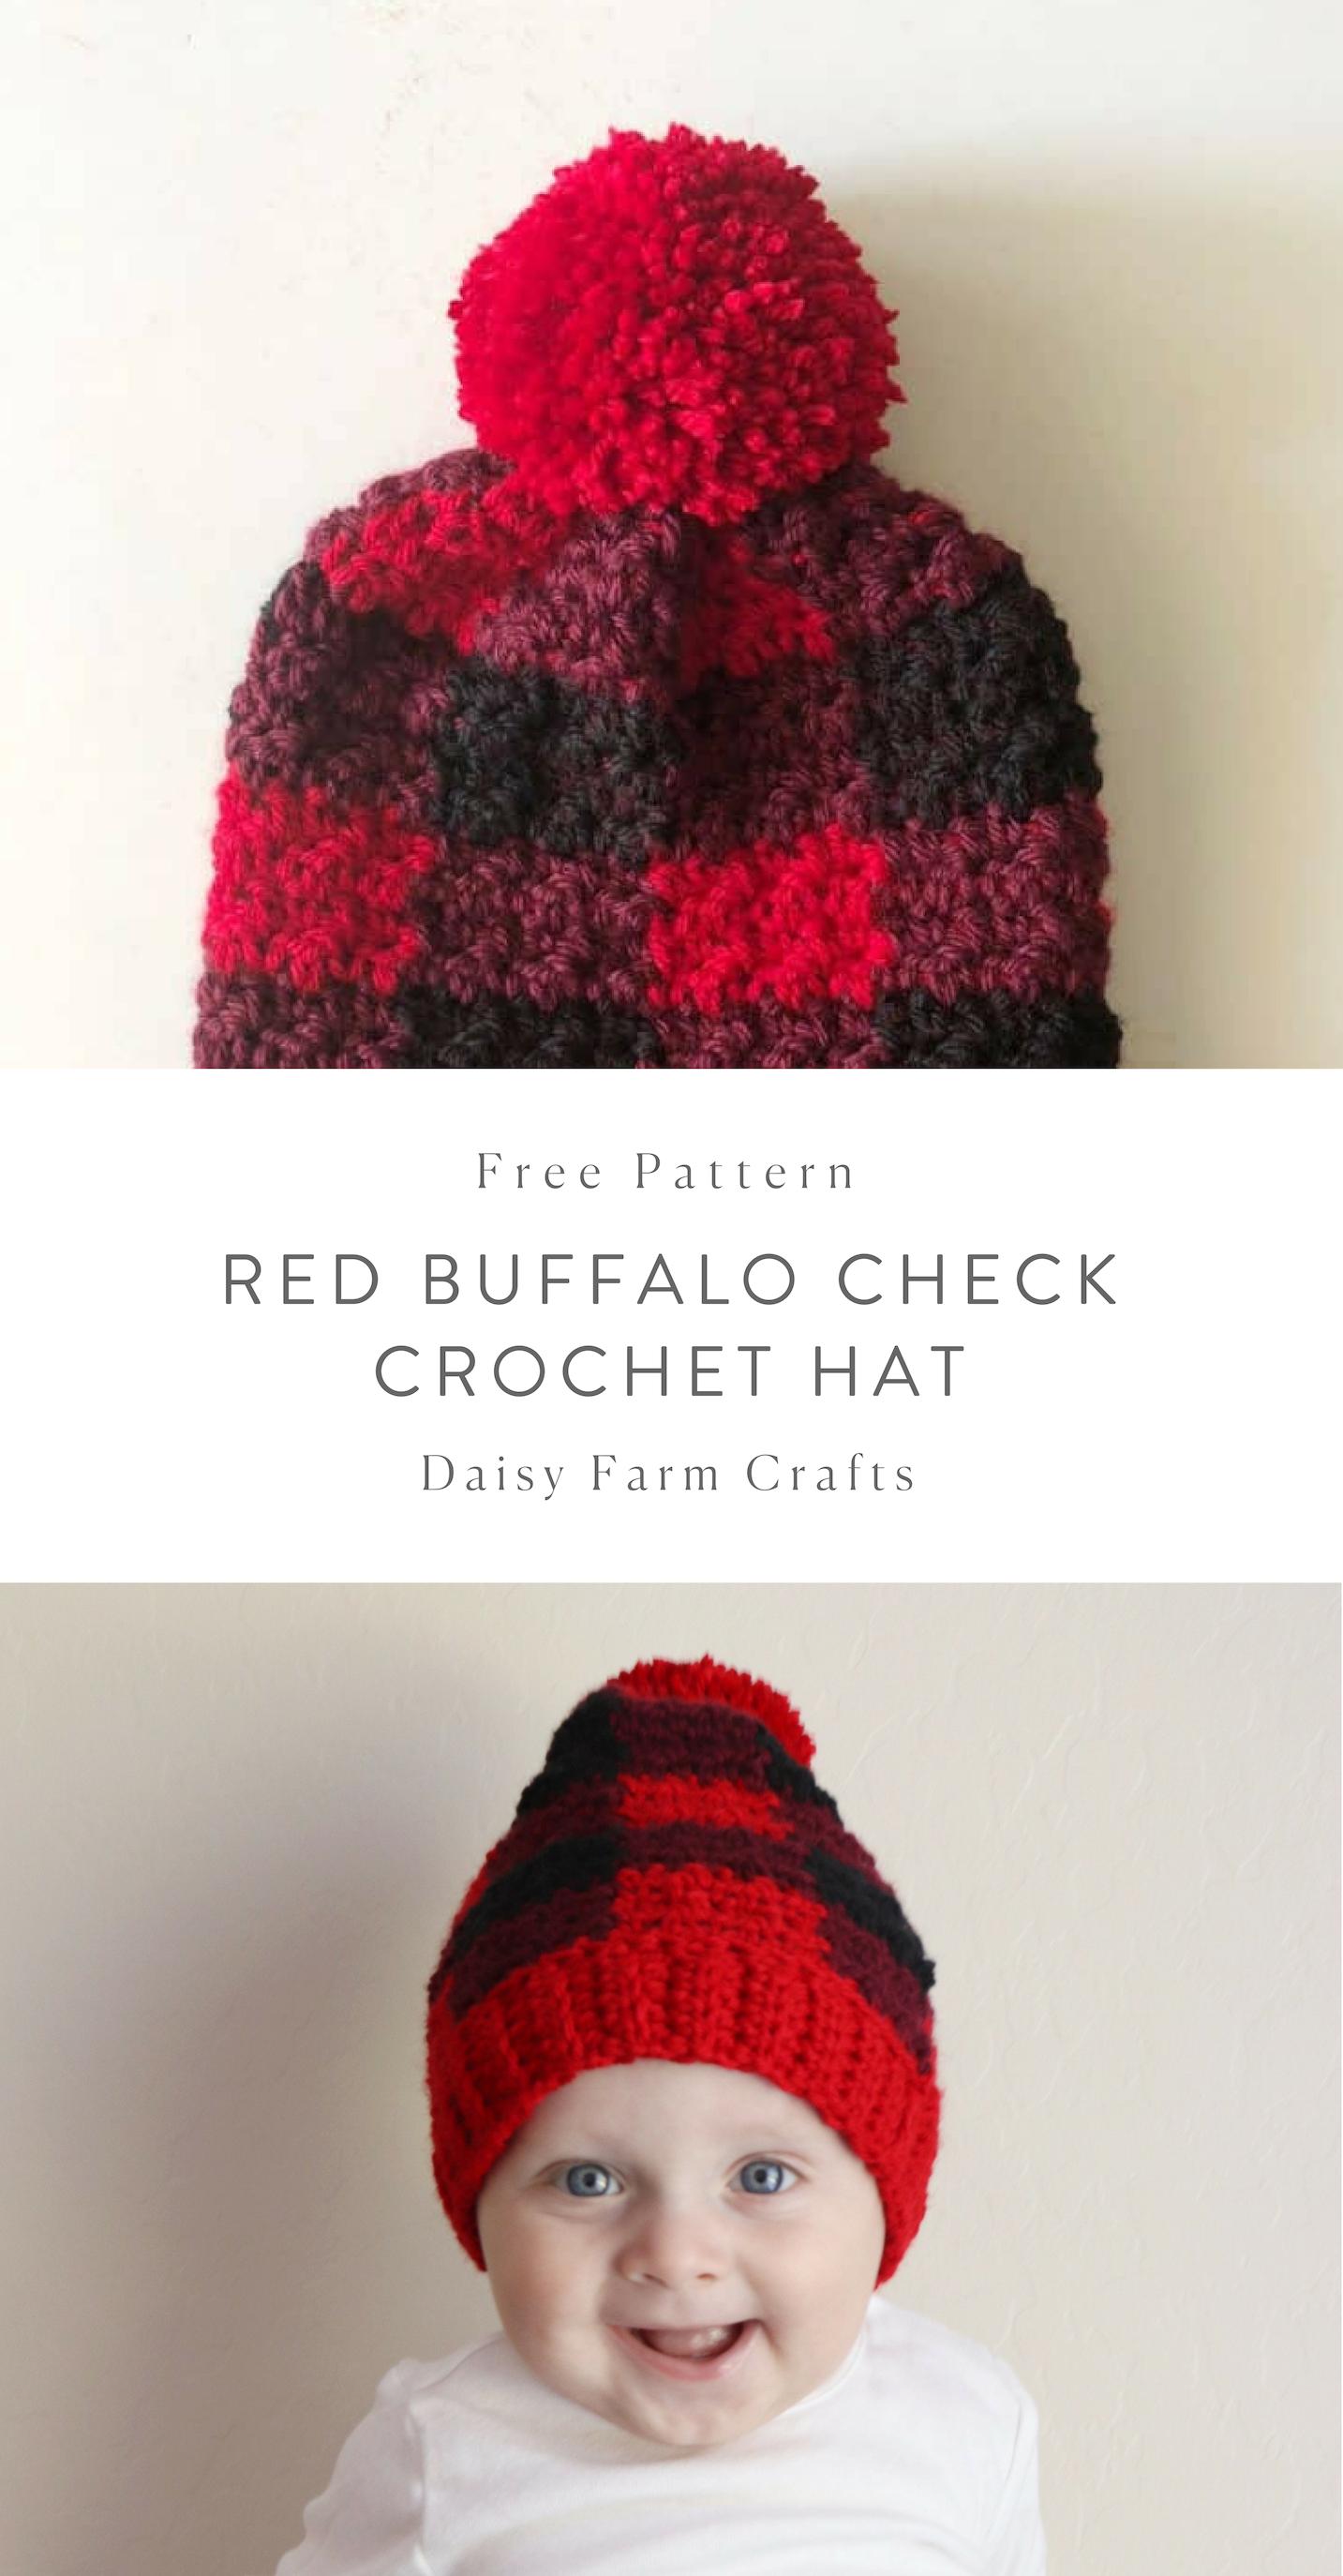 Free Pattern - Red Buffalo Check Crochet Hat | Beanie | Pinterest ...